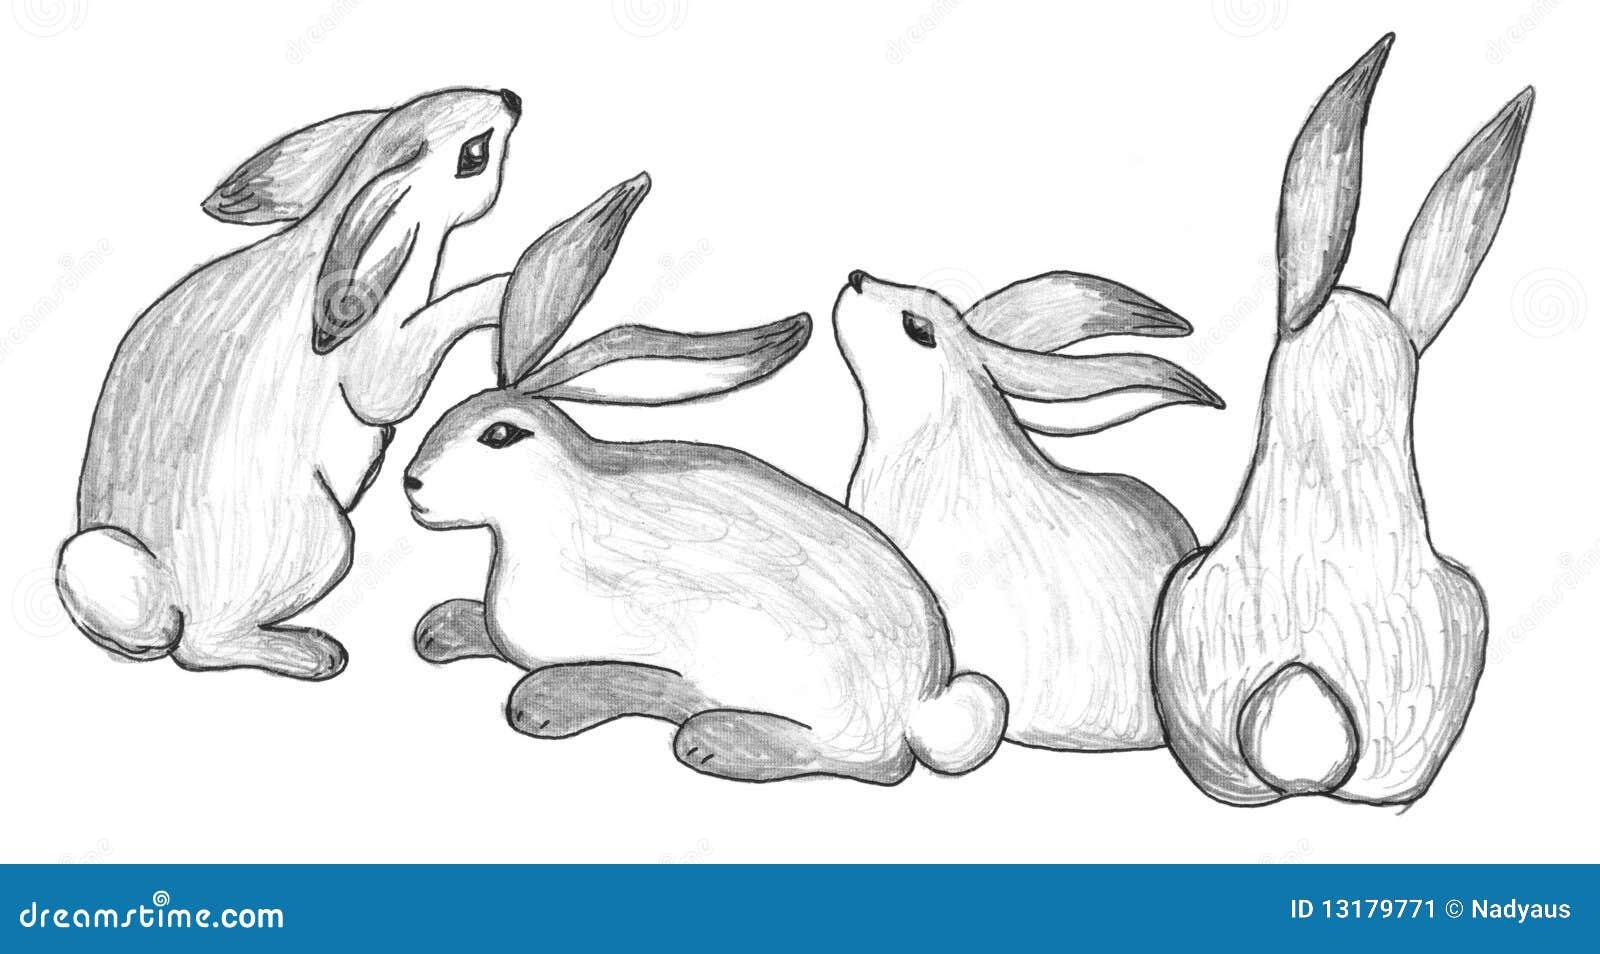 Sitting Rabbits Group Sketch Stock Illustration Illustration Of